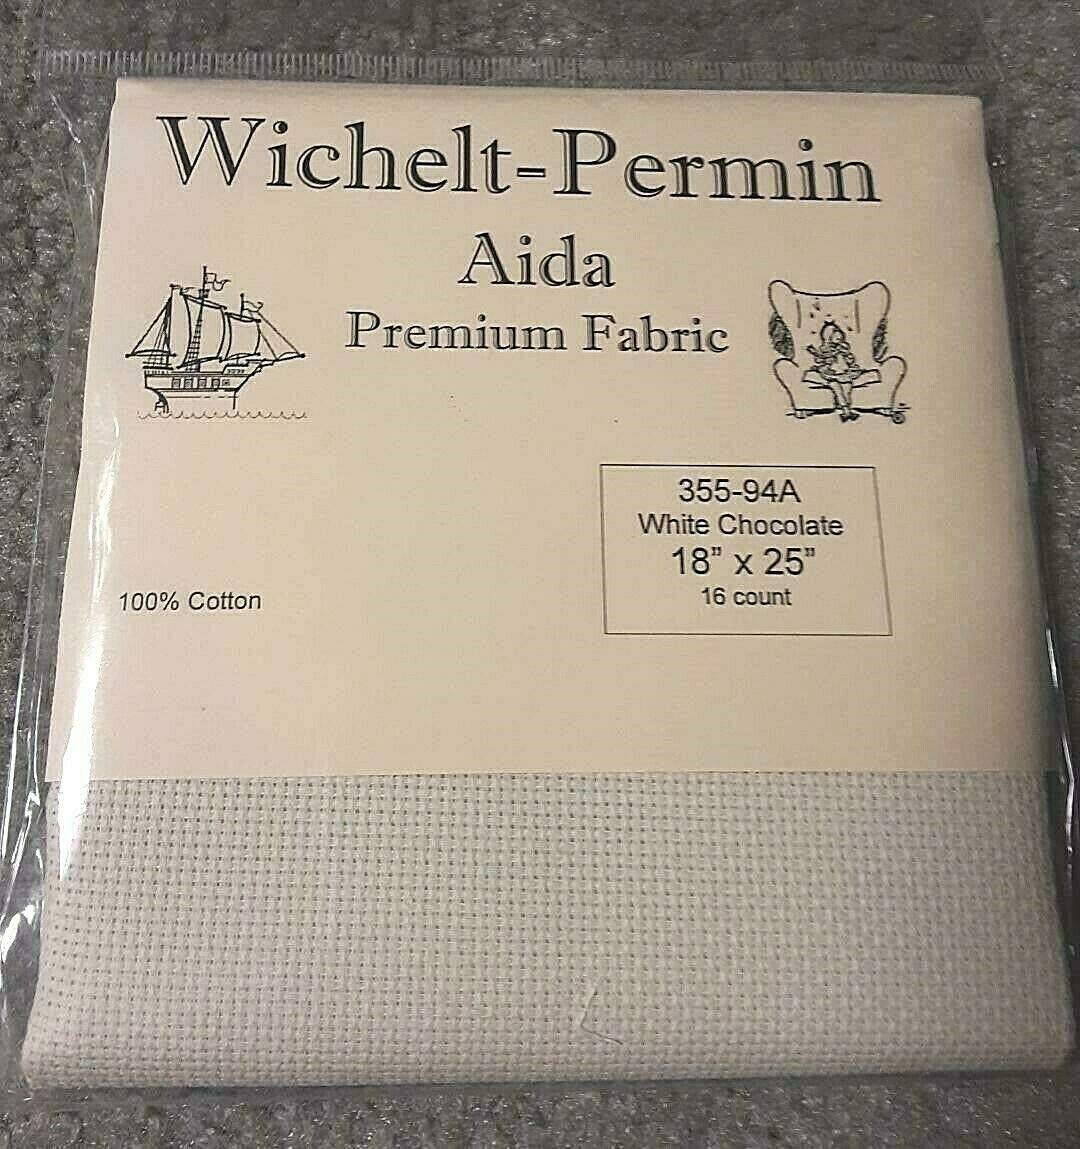 Wichelt Permin Aida Premium Fabric 16 Count 18 x 25 White Chocolate